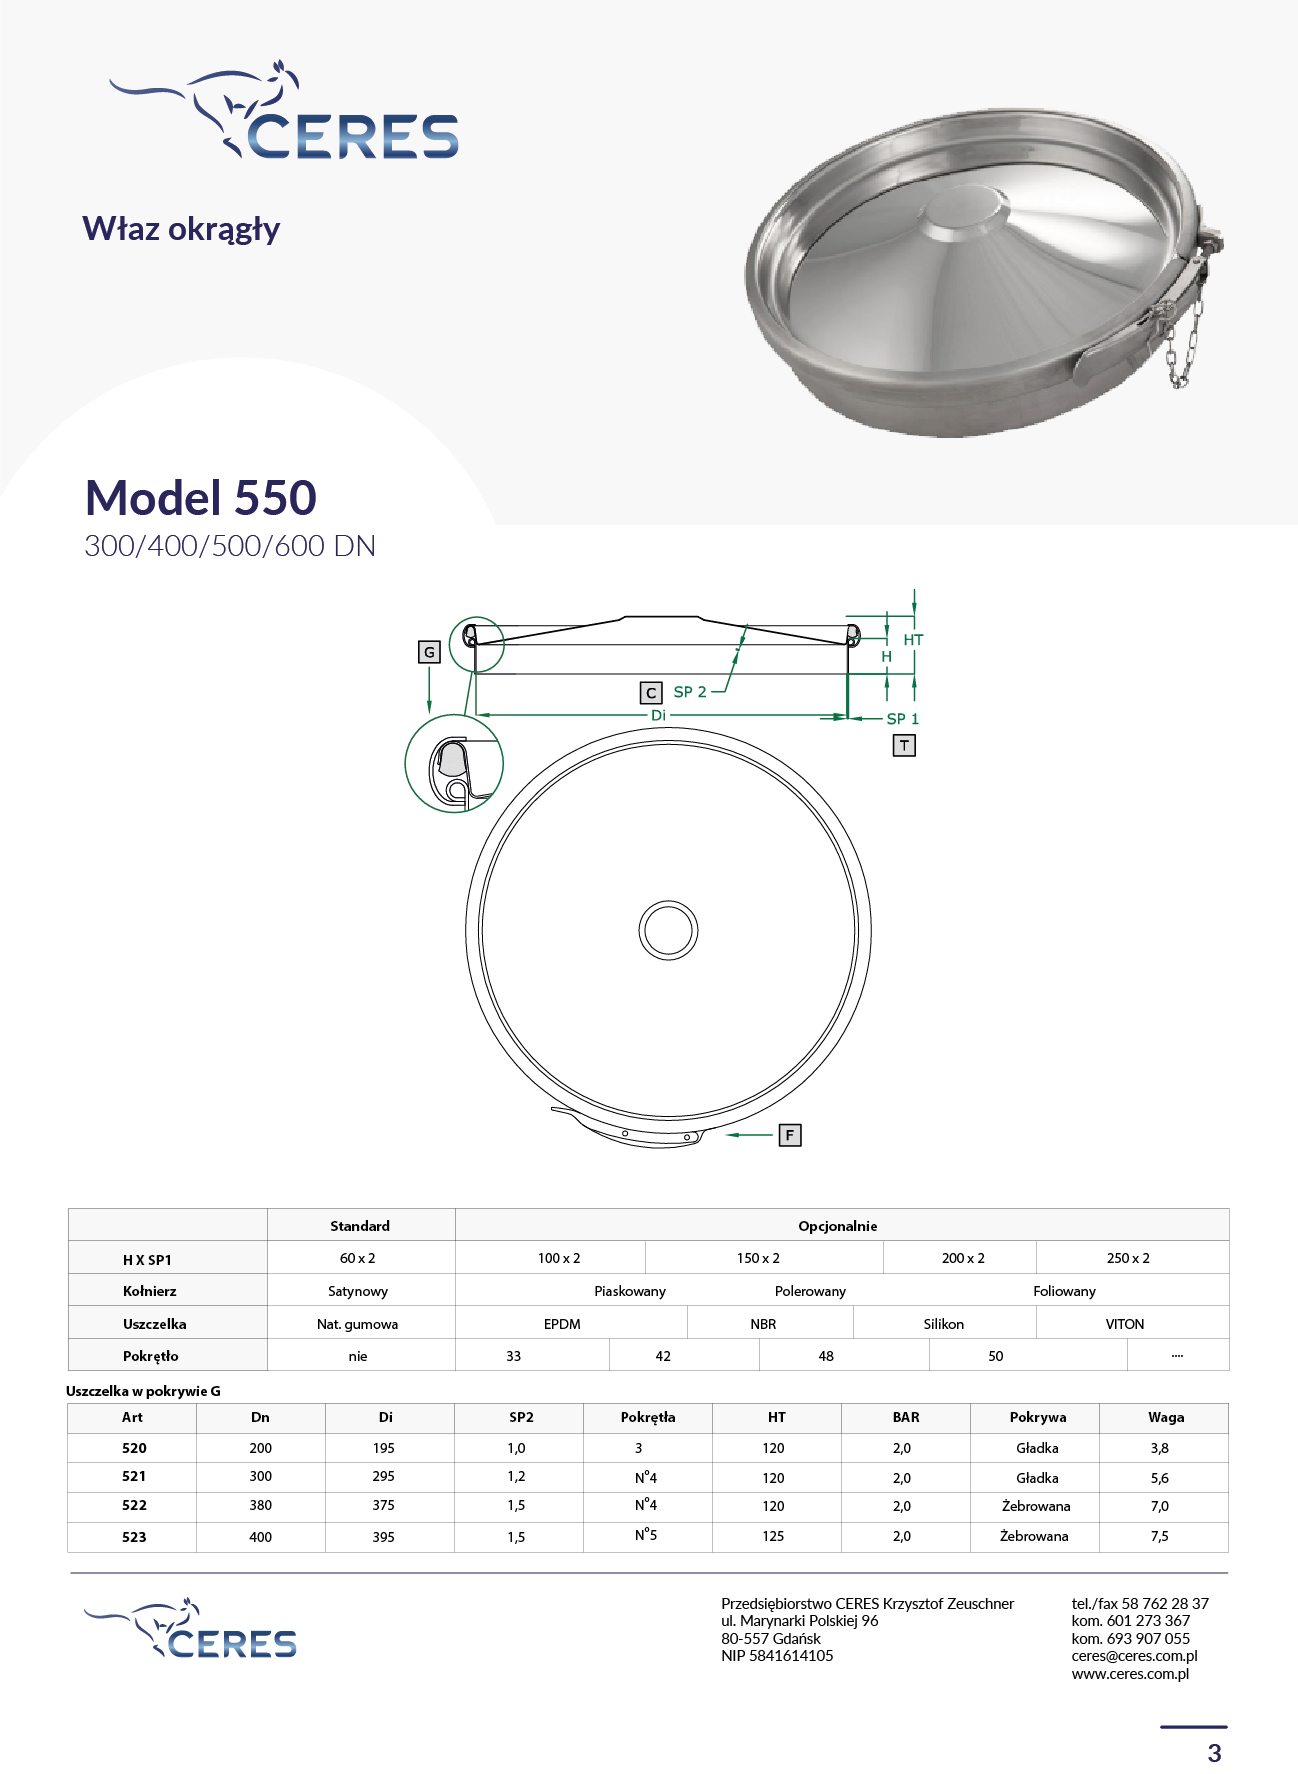 MODEL 550